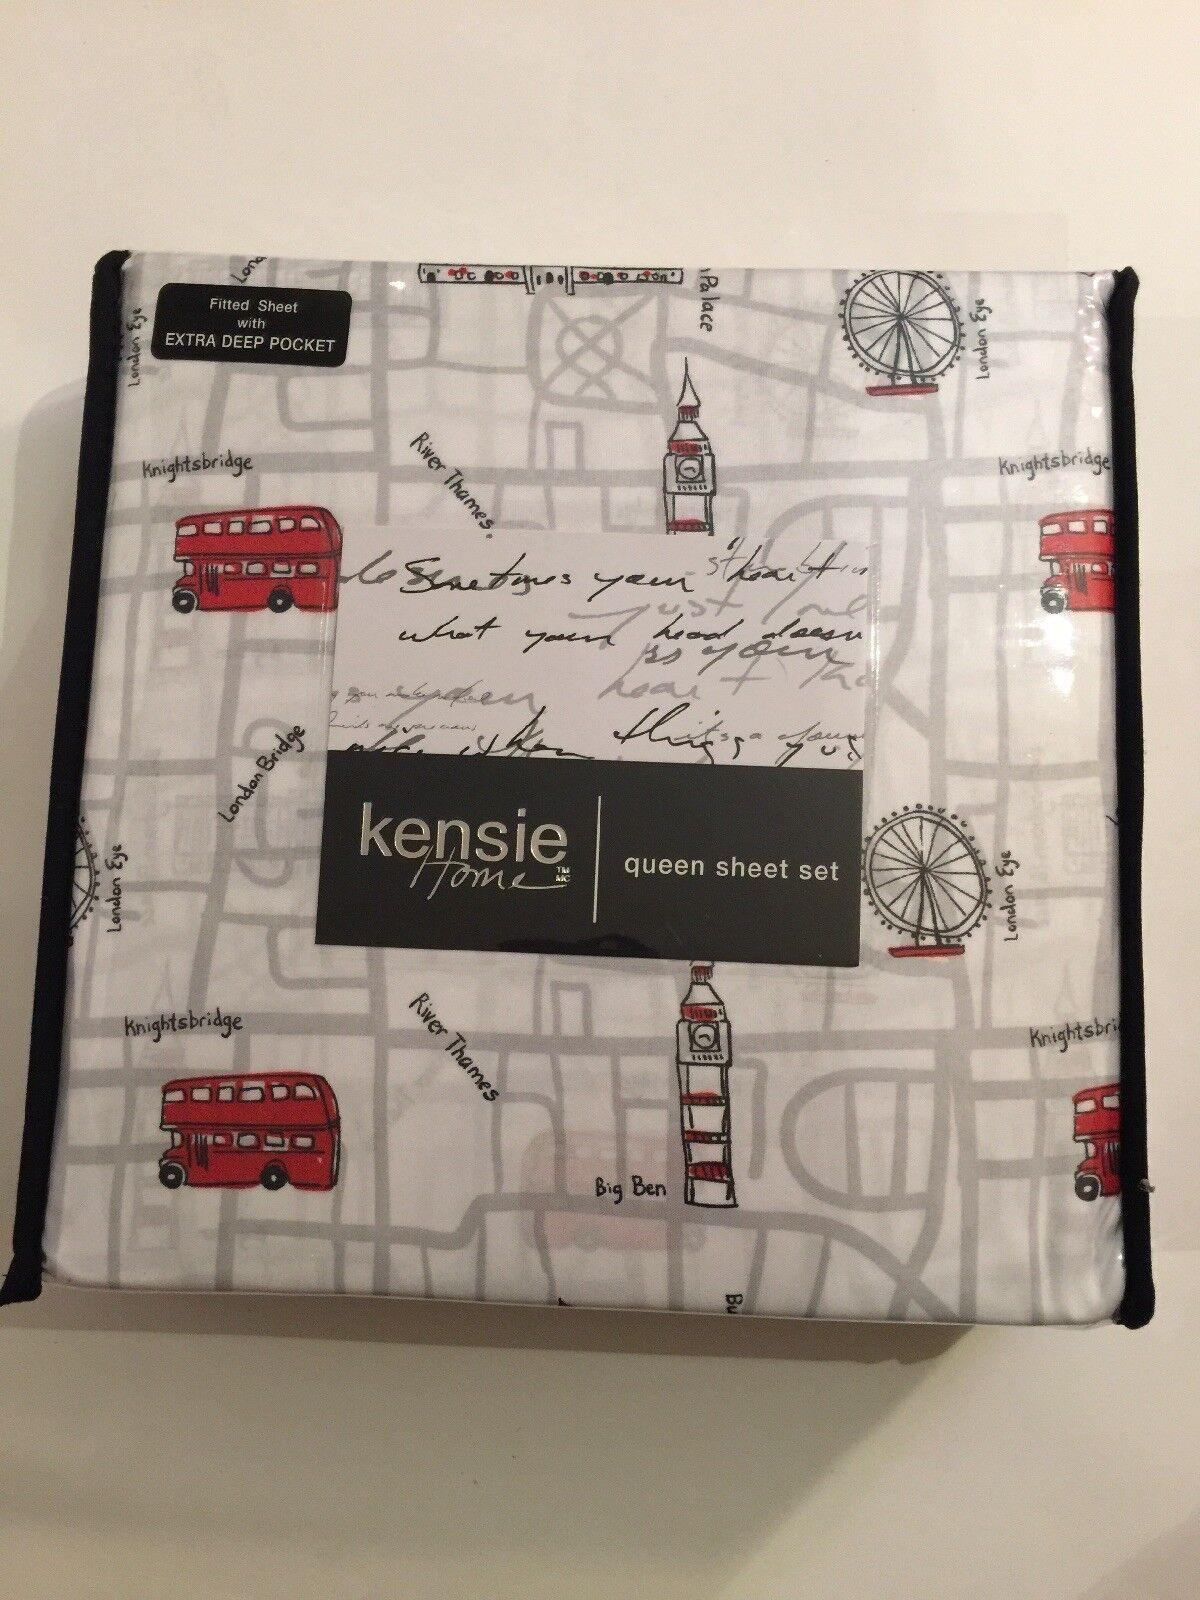 NEW Kensie  London Map Queen Sheet Set  75.00 + Free Shipping